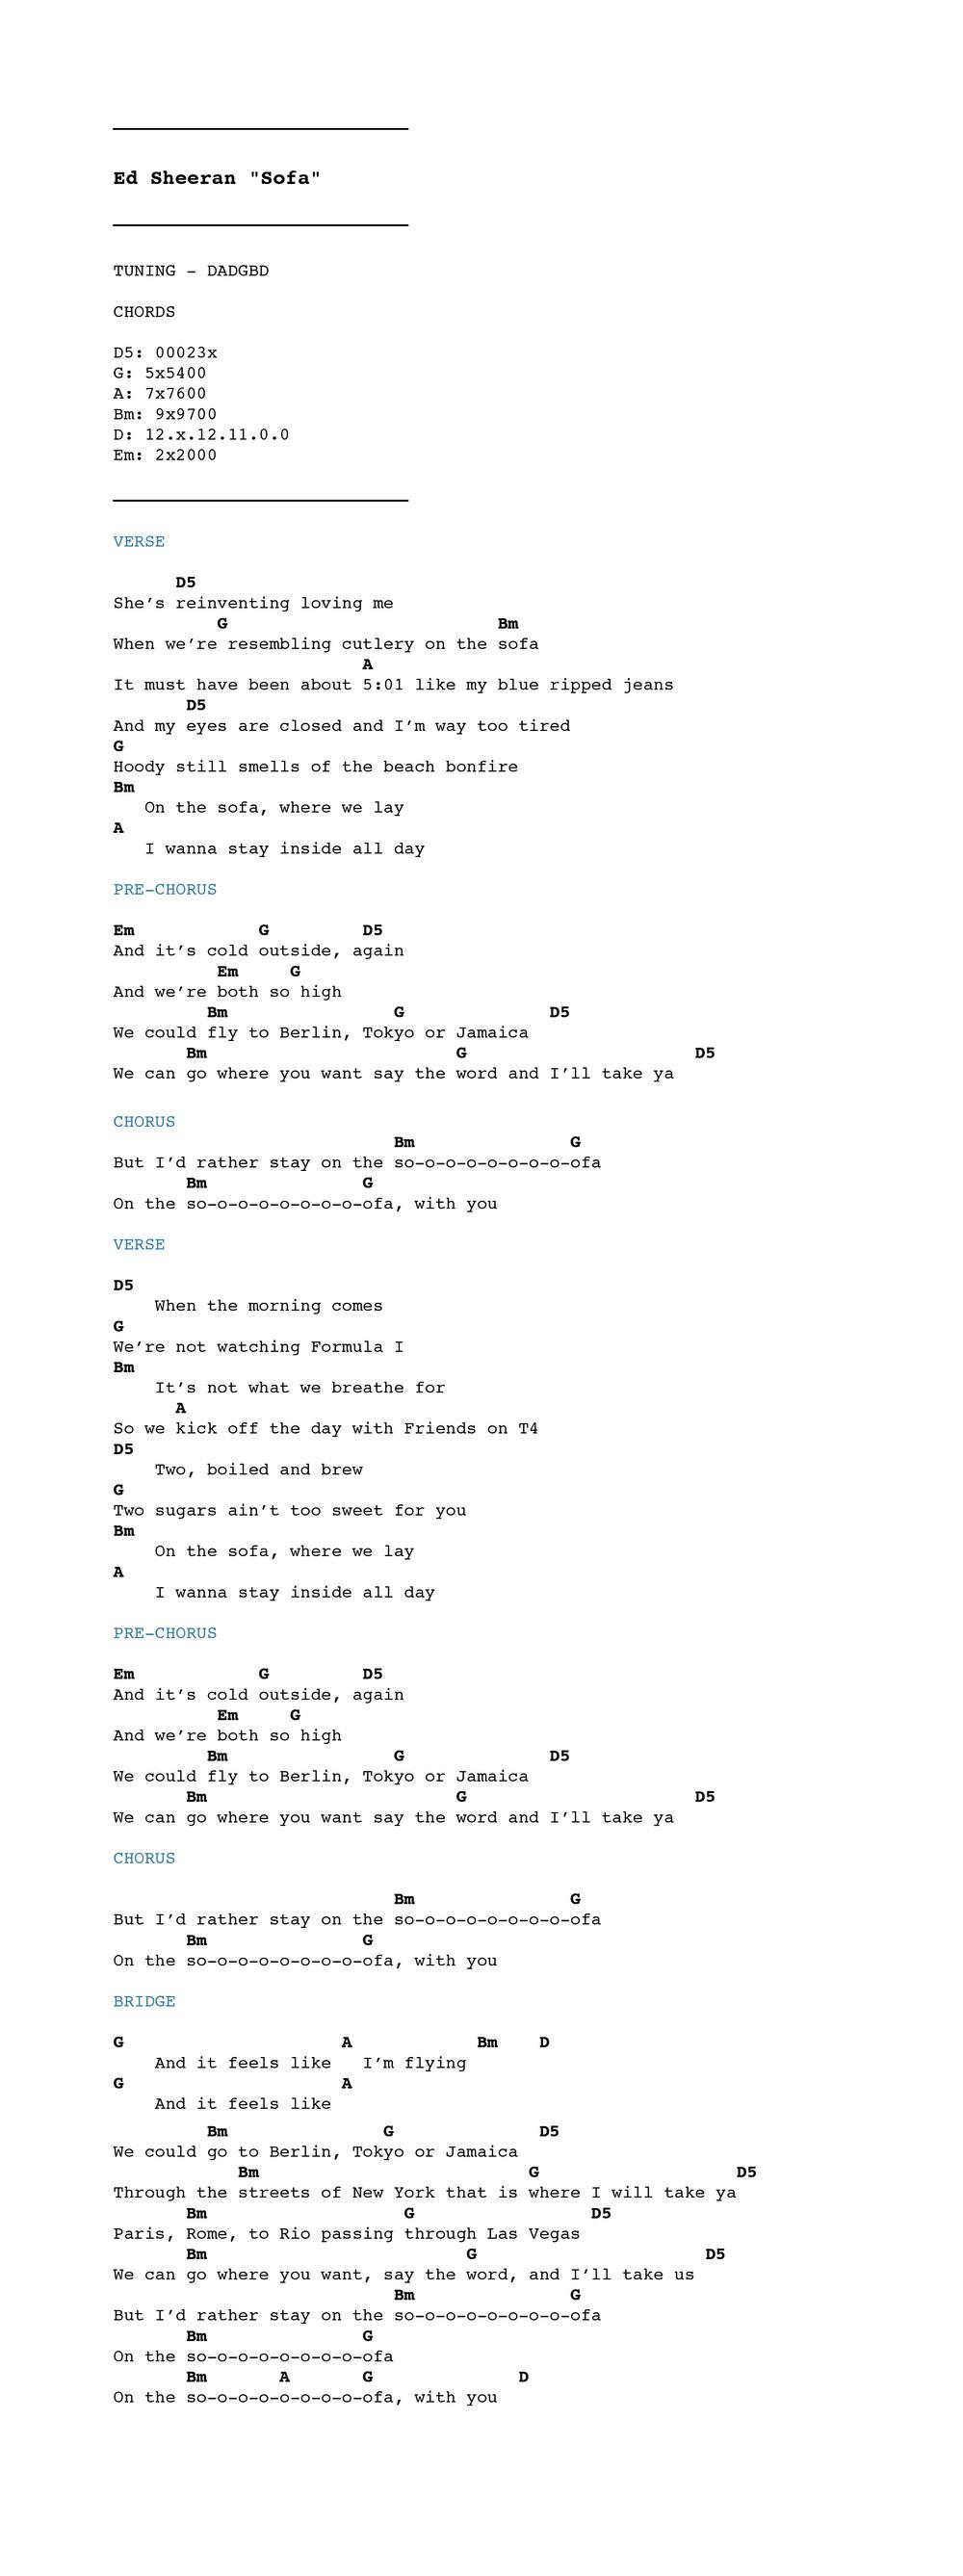 Sofa ed sheeran guitar chords redglobalmx ed sheeran sofa chordistry hexwebz Choice Image